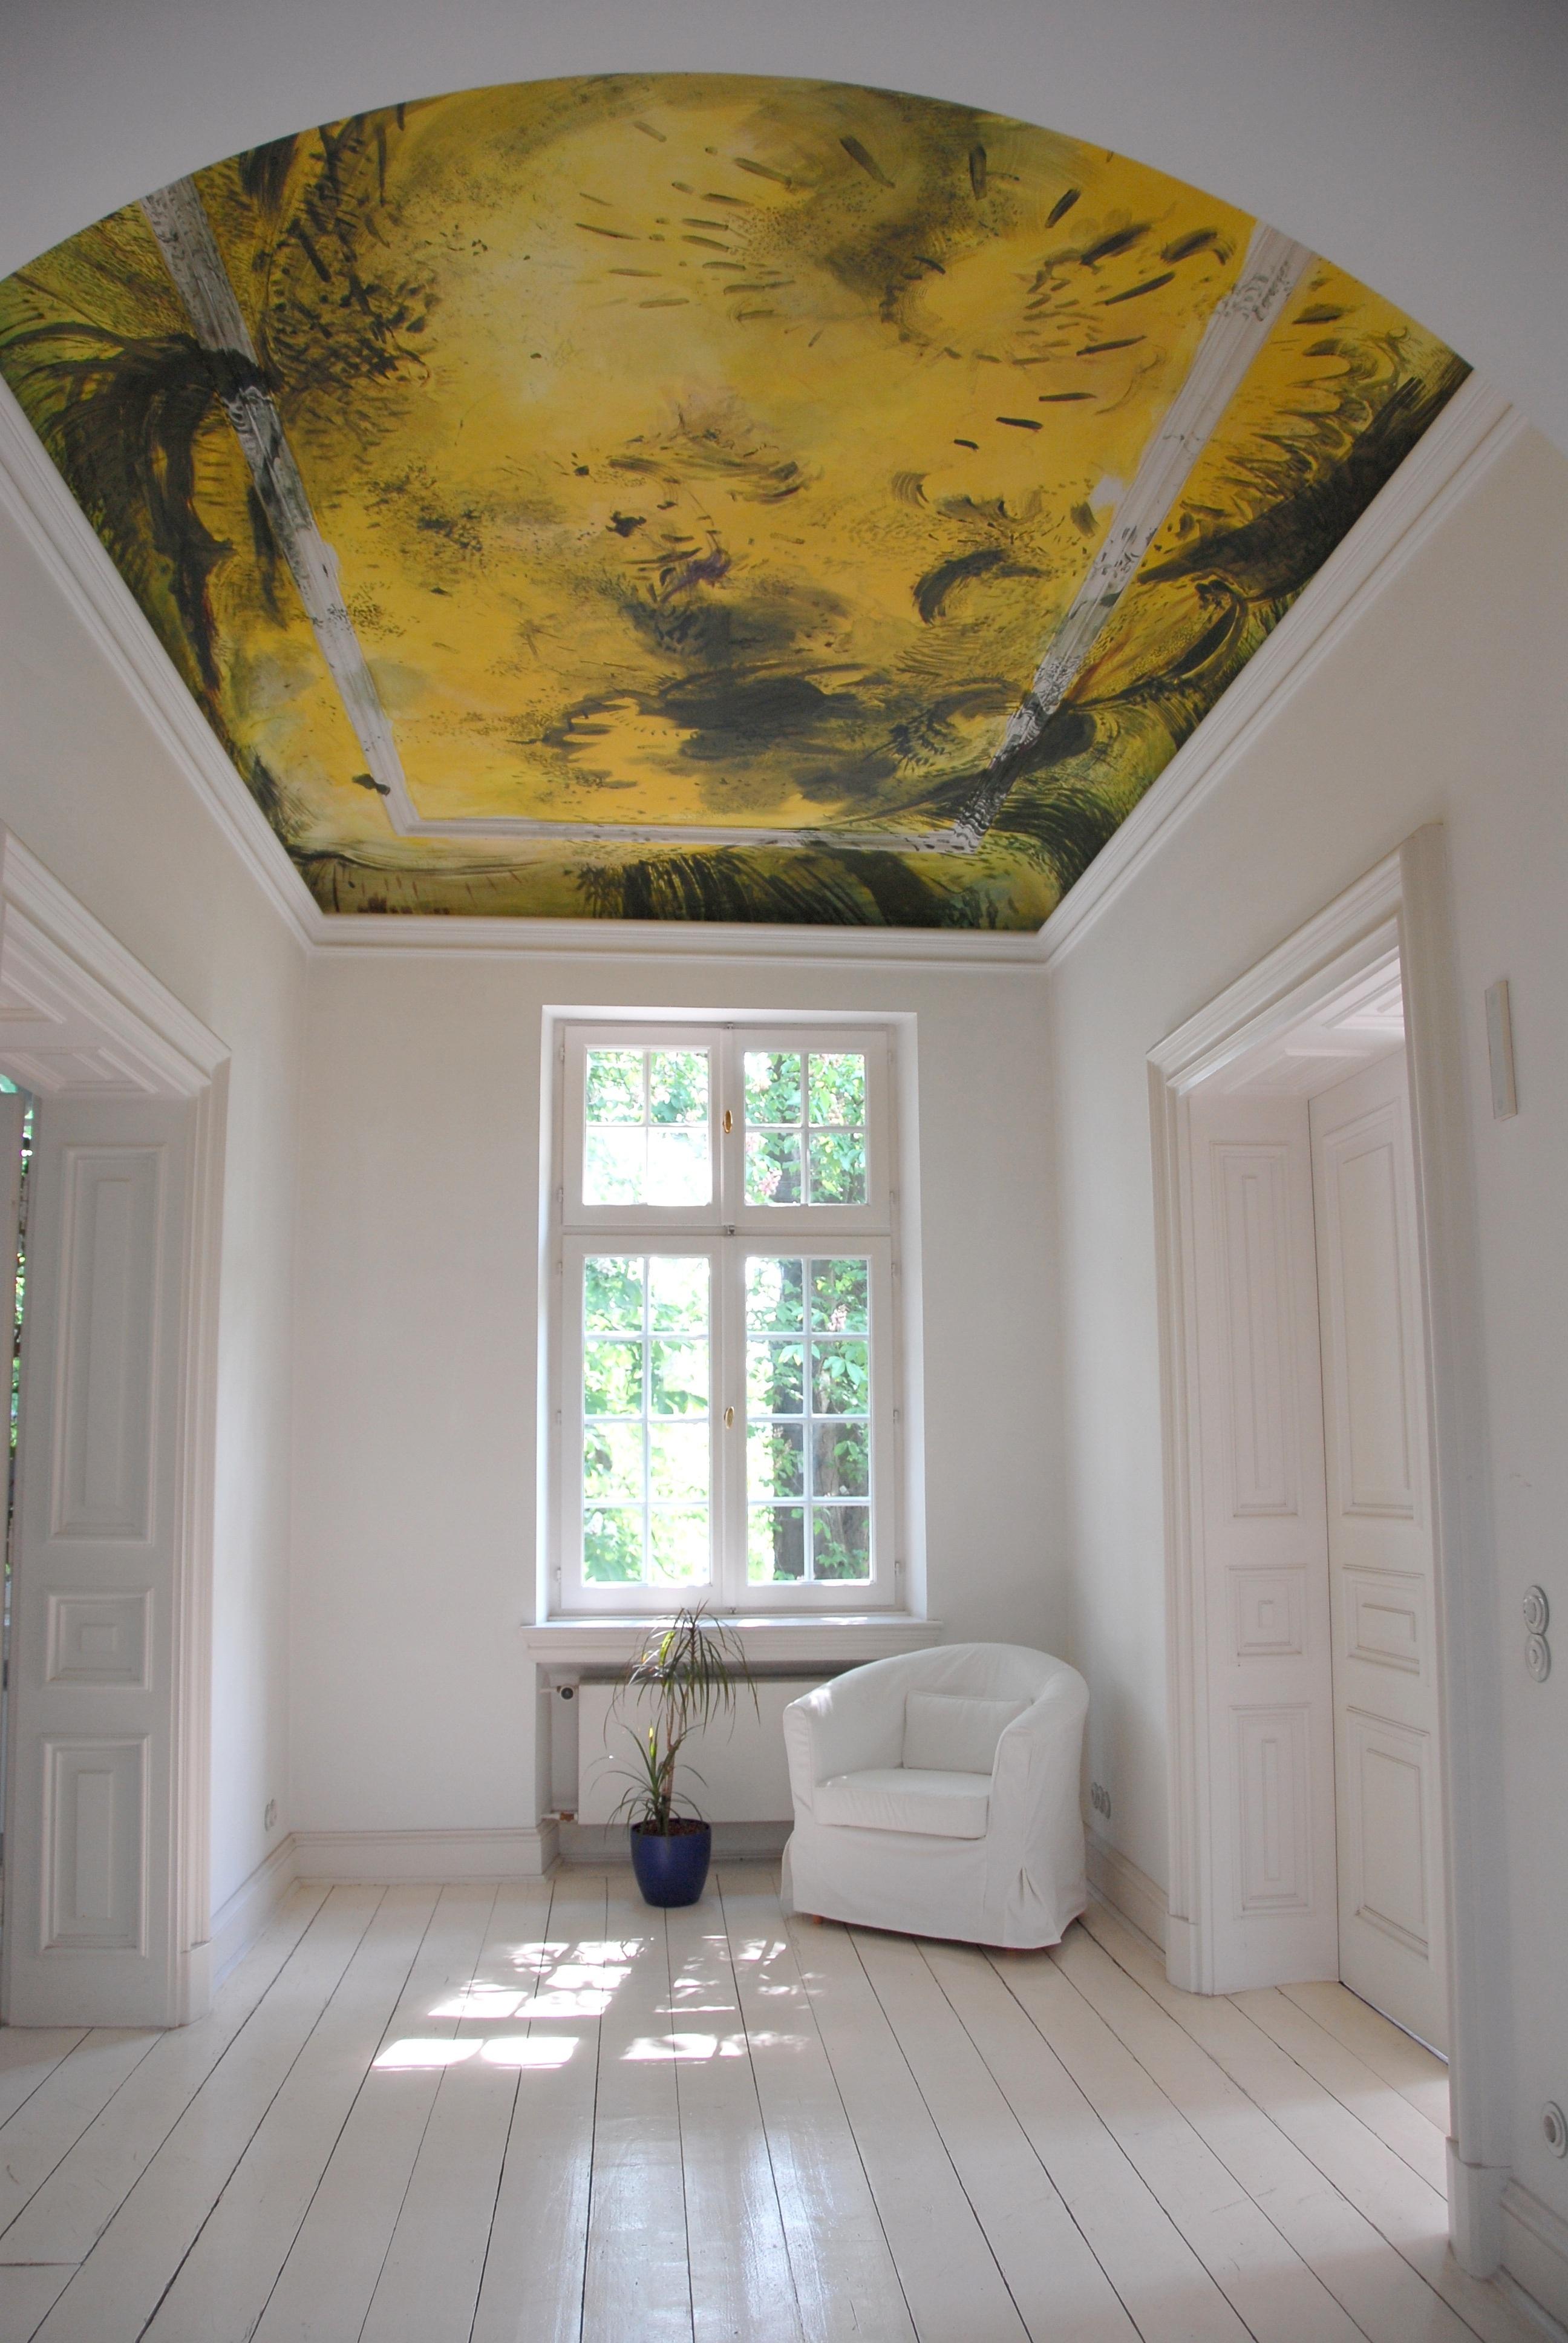 file haus bitz treppenhaus wikimedia commons. Black Bedroom Furniture Sets. Home Design Ideas